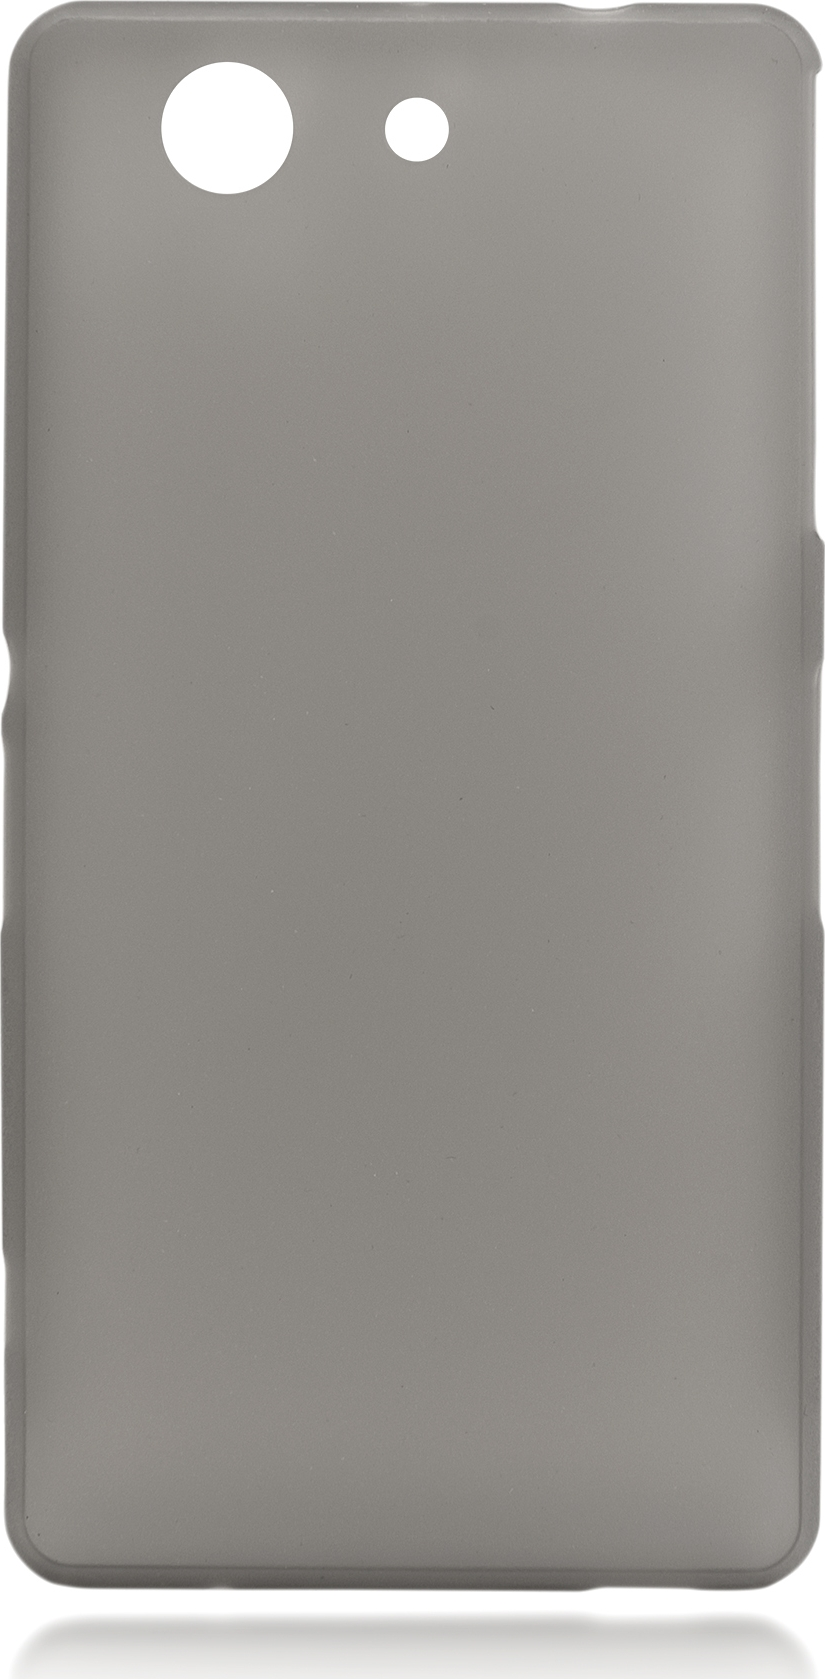 Чехол Brosco для Sony Xperia Z3 Compact, серый все цены